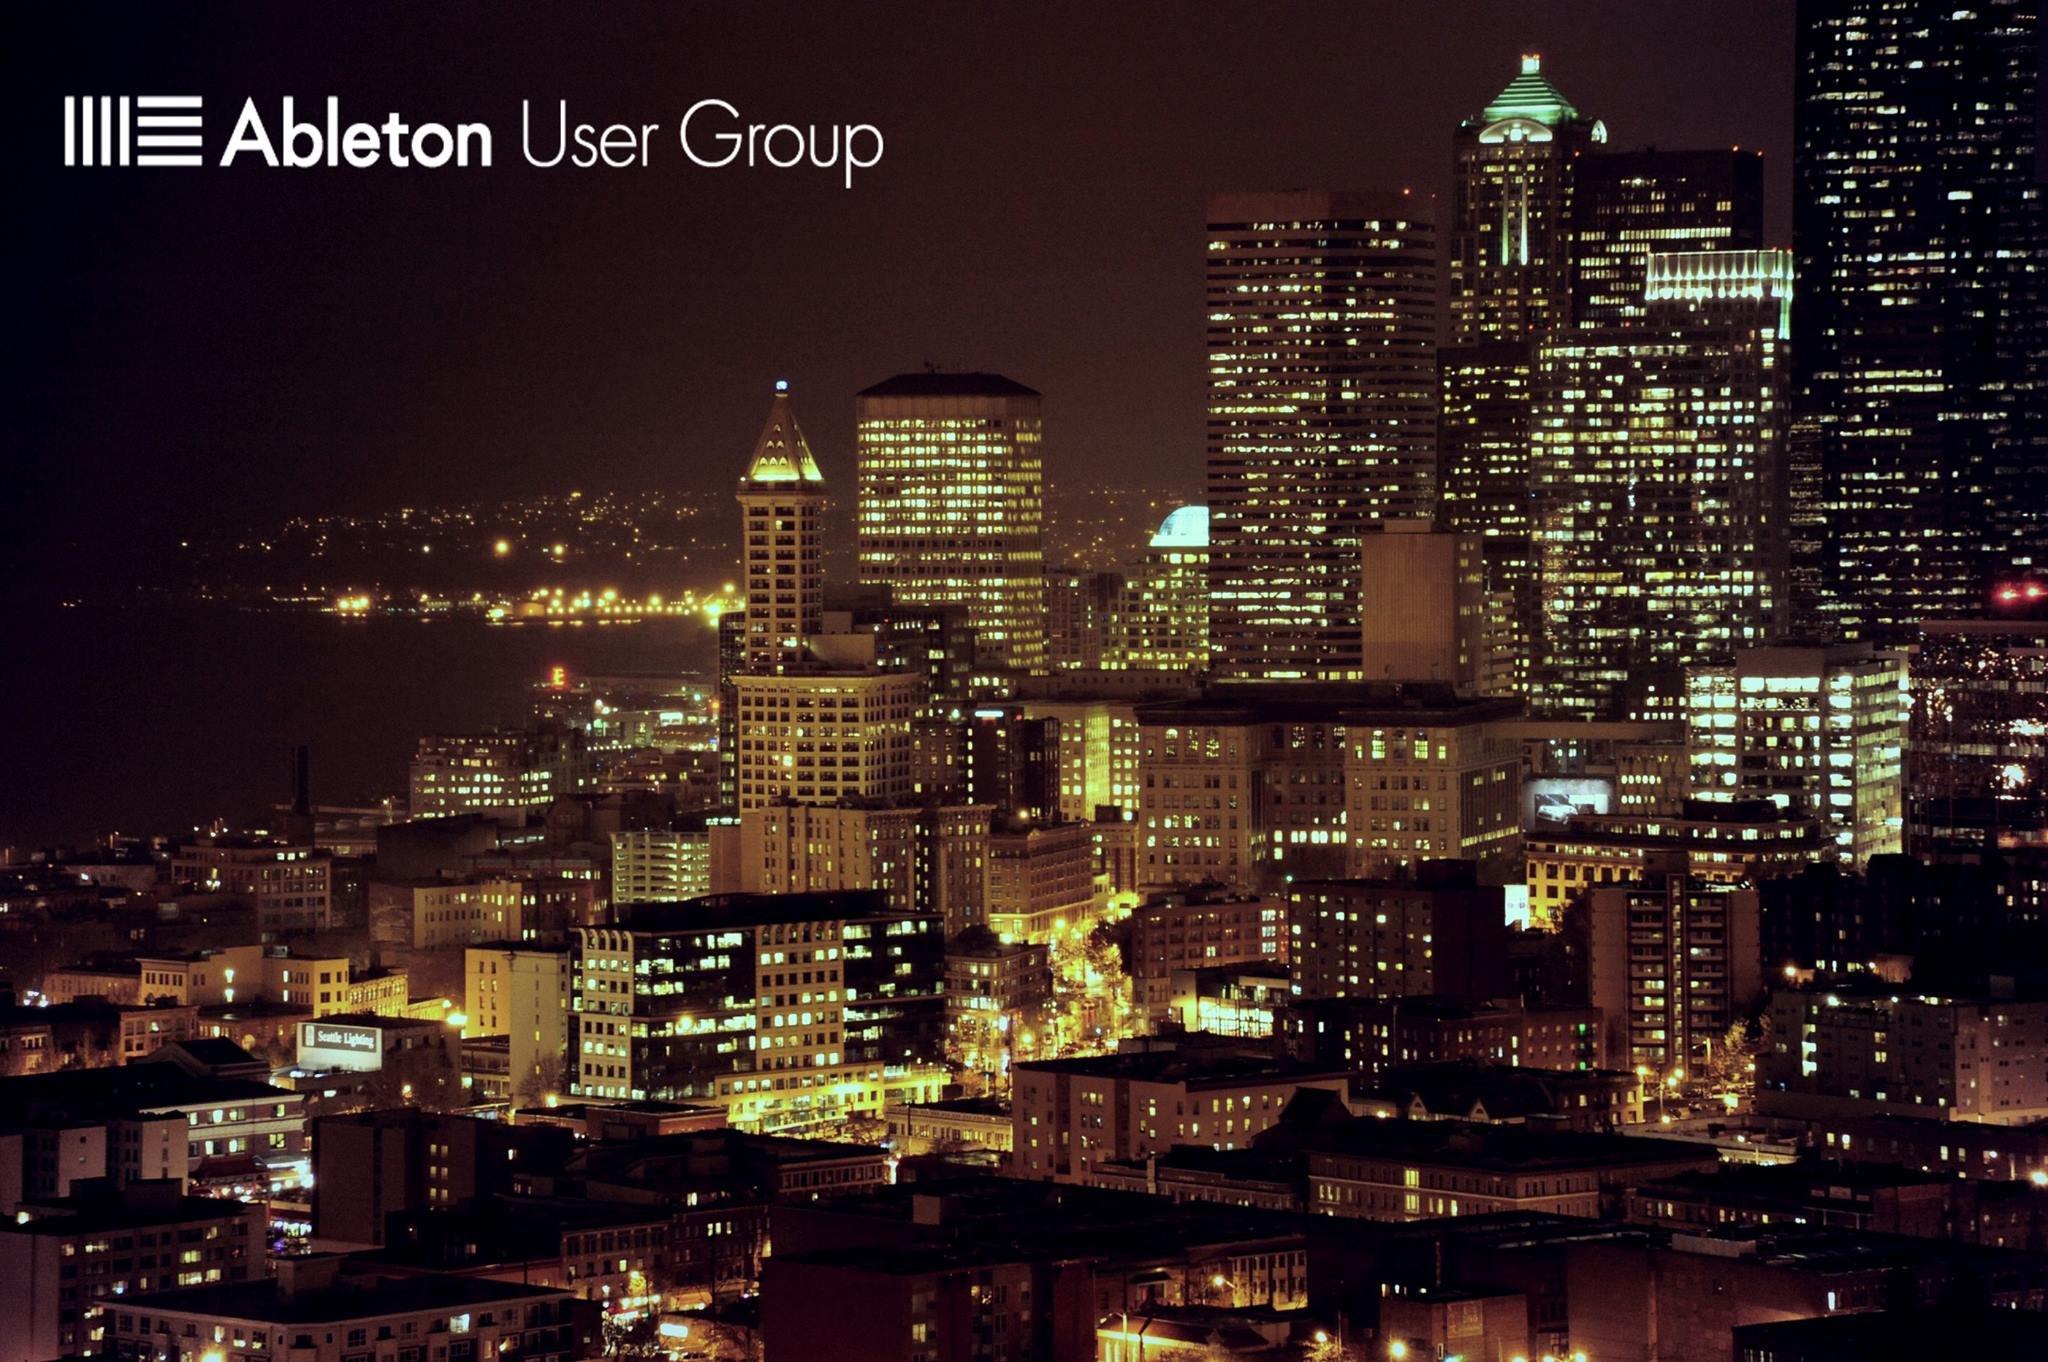 bangalore ableton user group.jpg